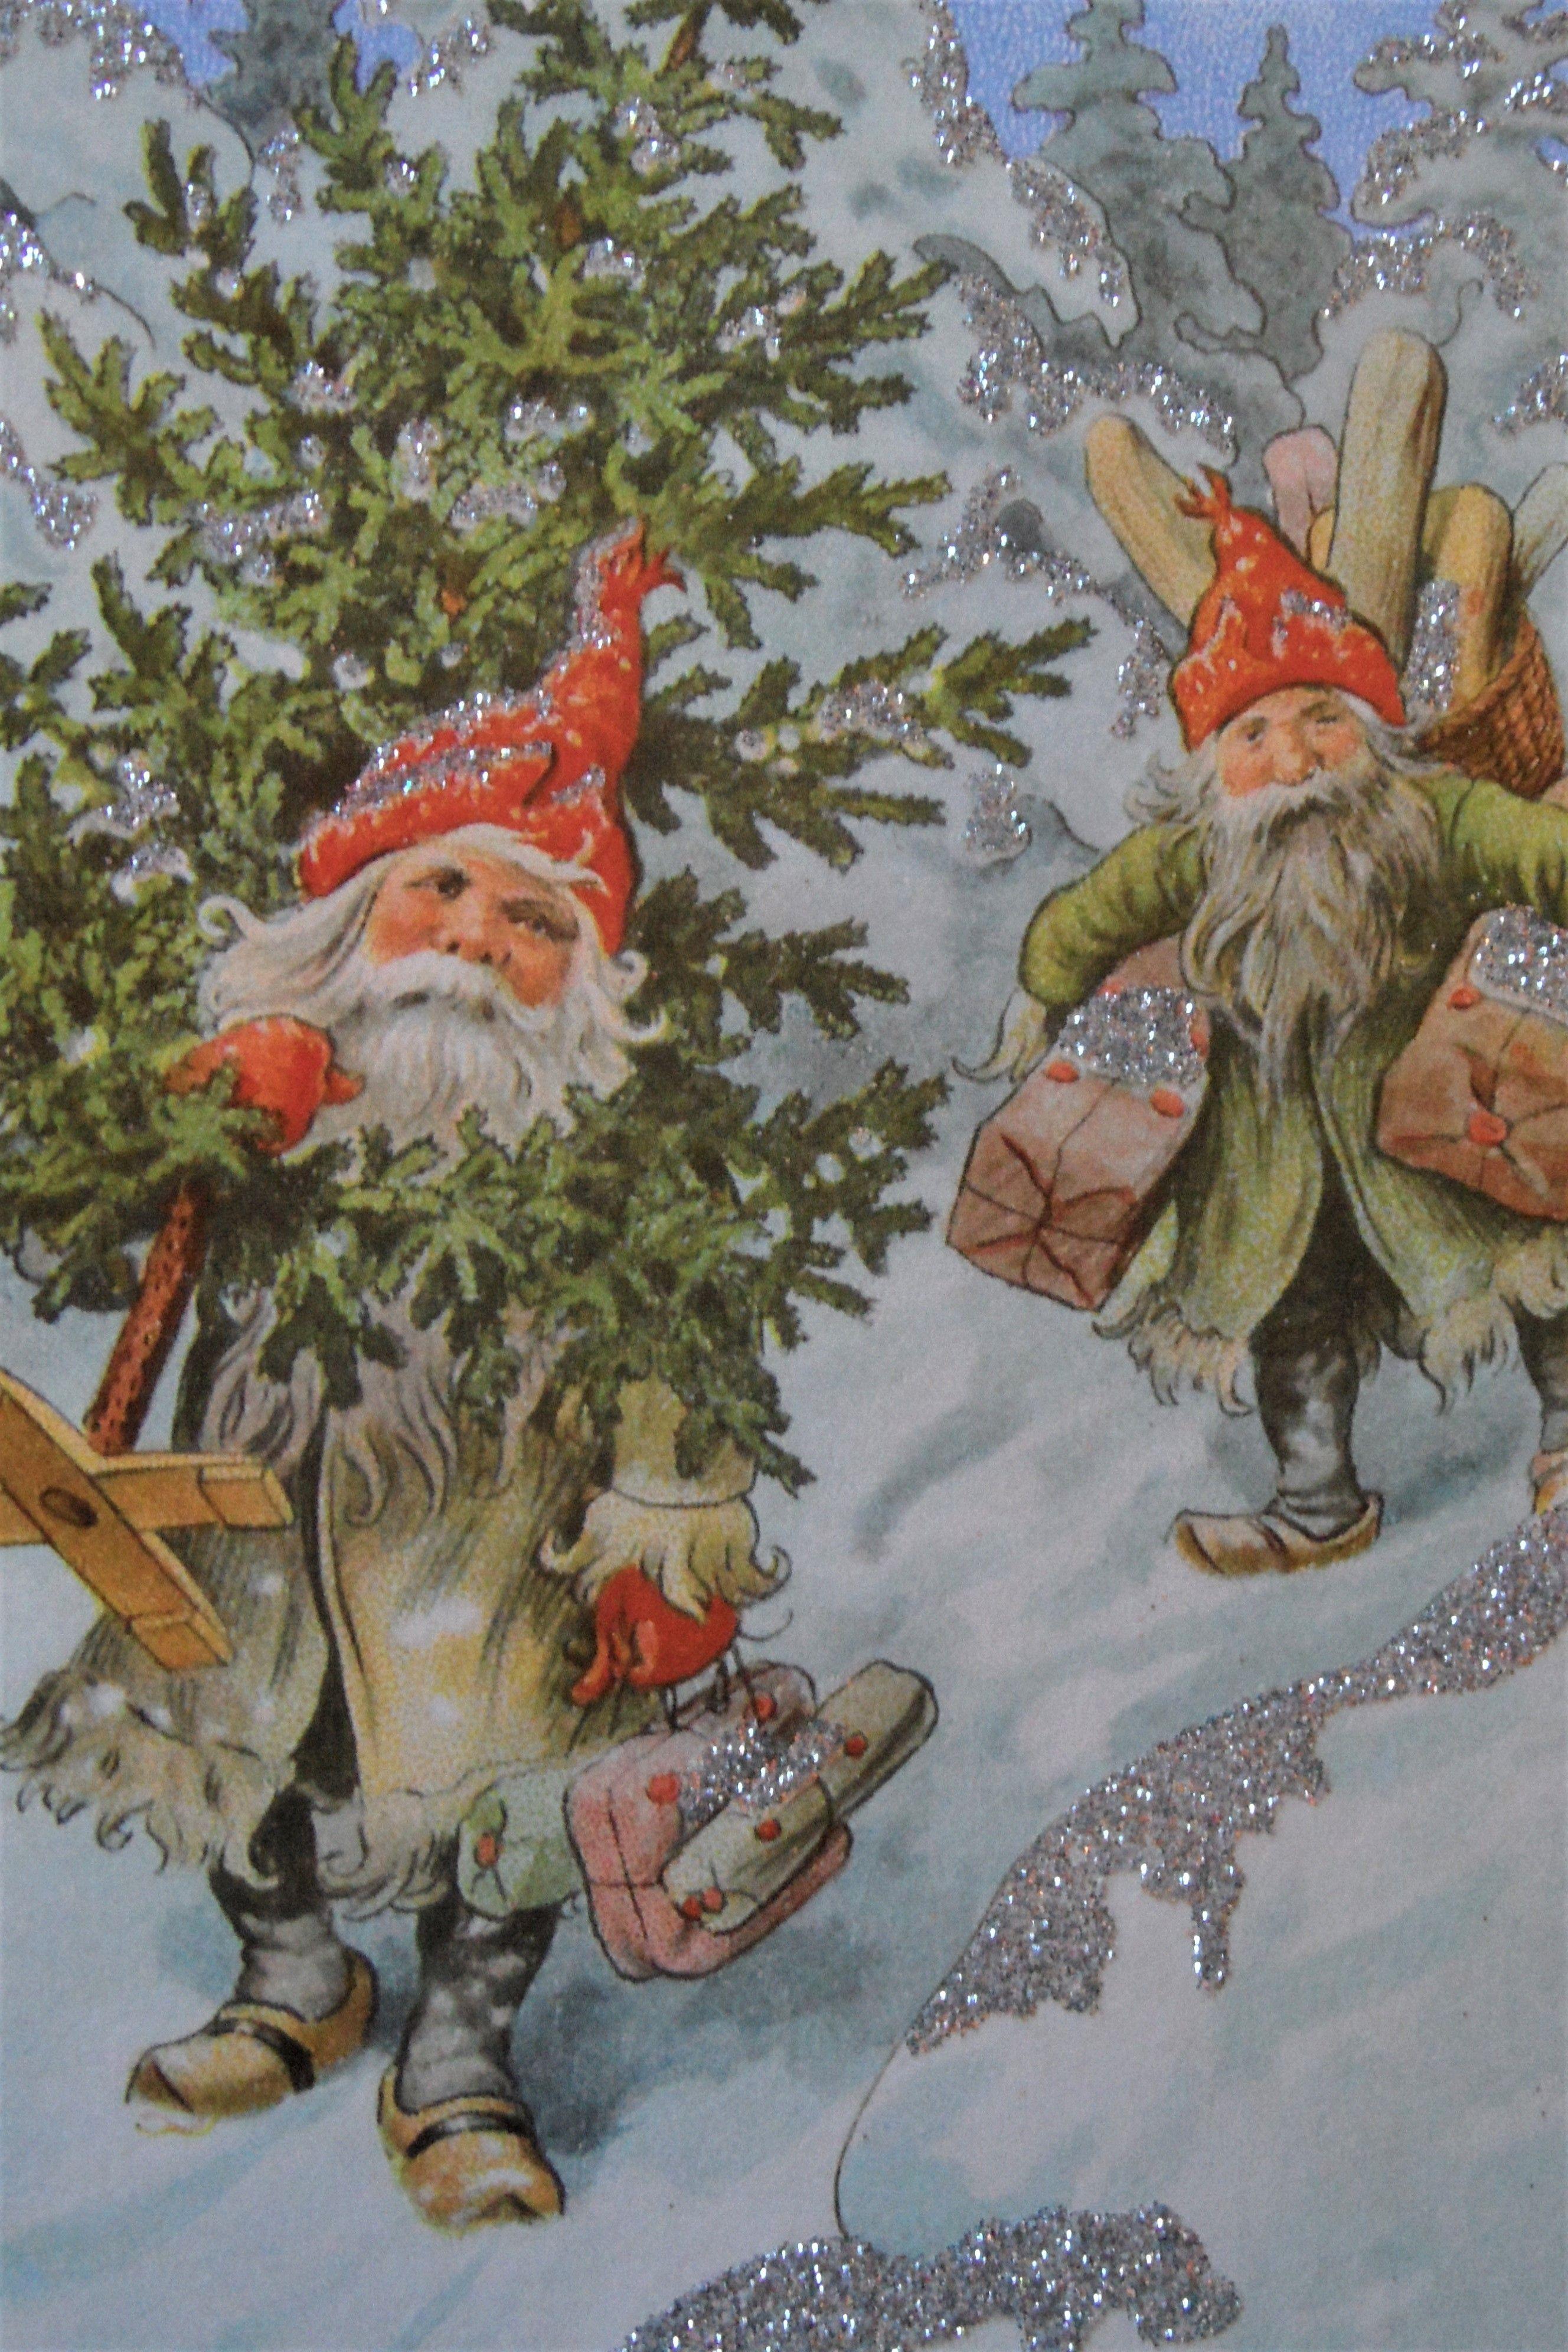 Pin by Agi on Swedish Christmas cards | Pinterest | Swedish ...